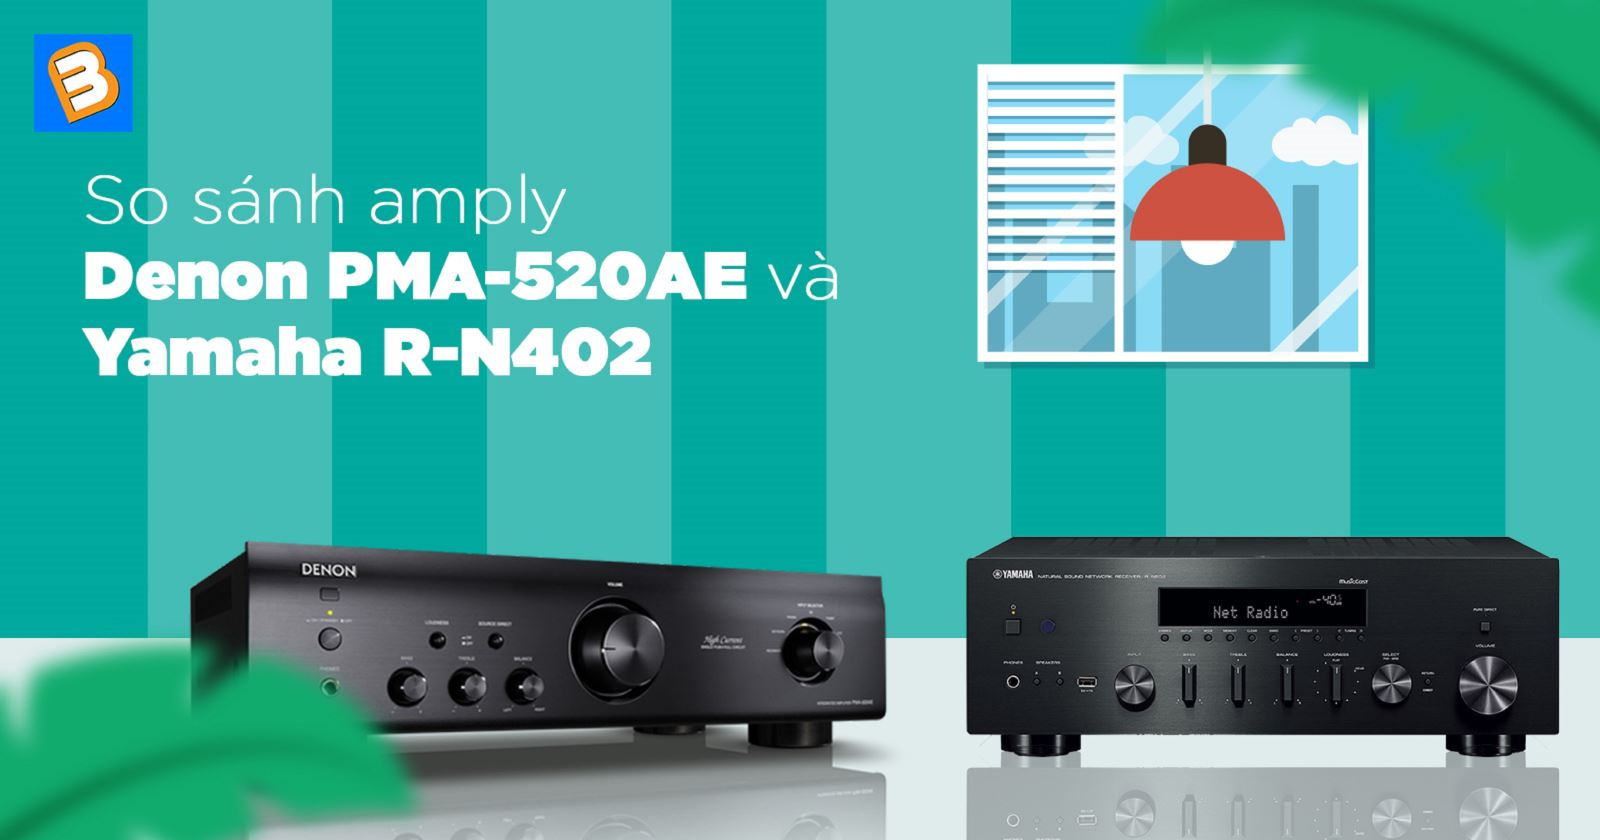 So sánh amply Denon PMA-520AE vàYamaha R-N402